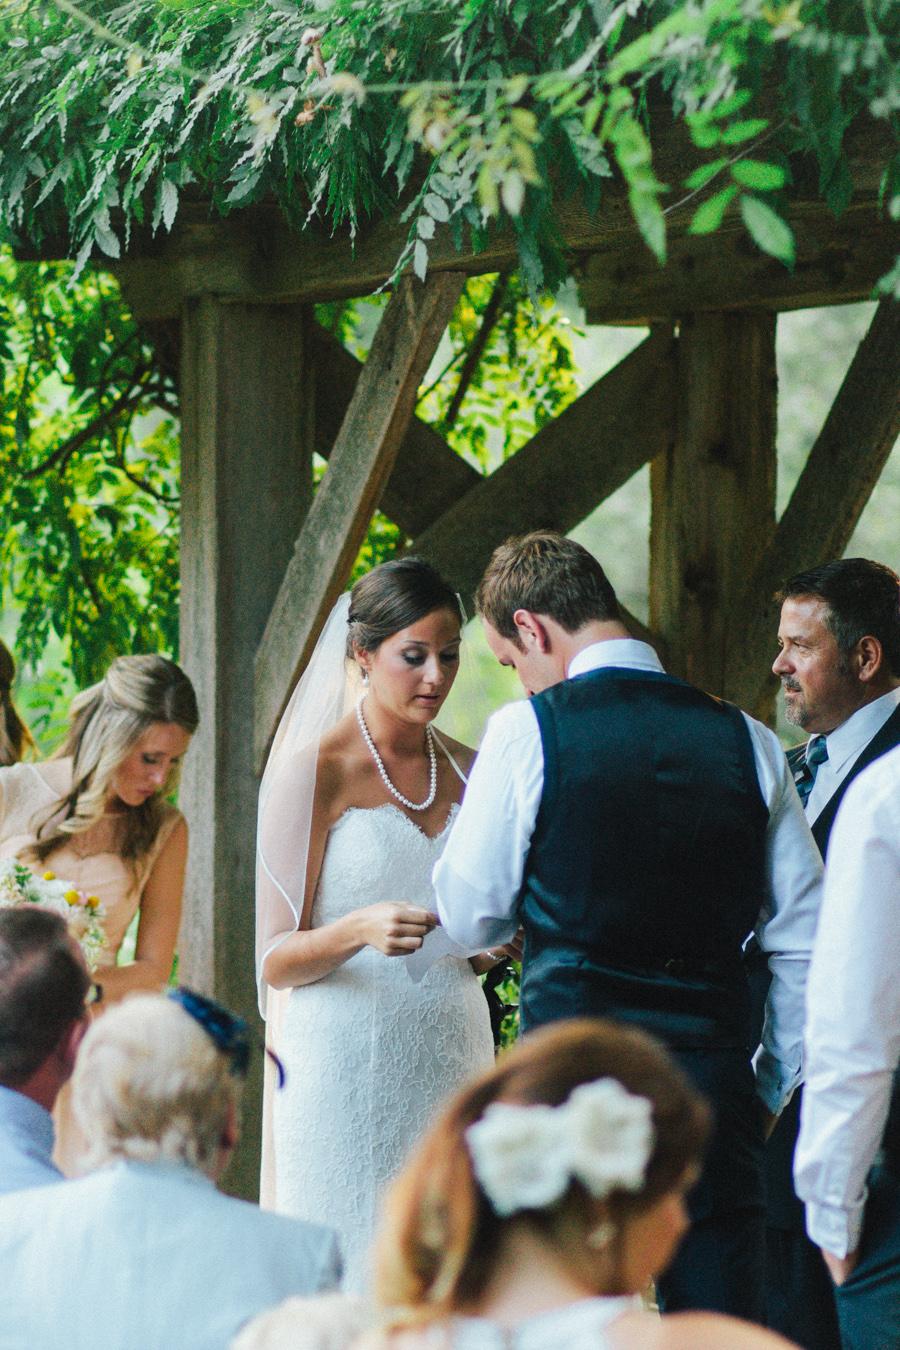 jolly_wedding_morton_arboretum-33.JPG